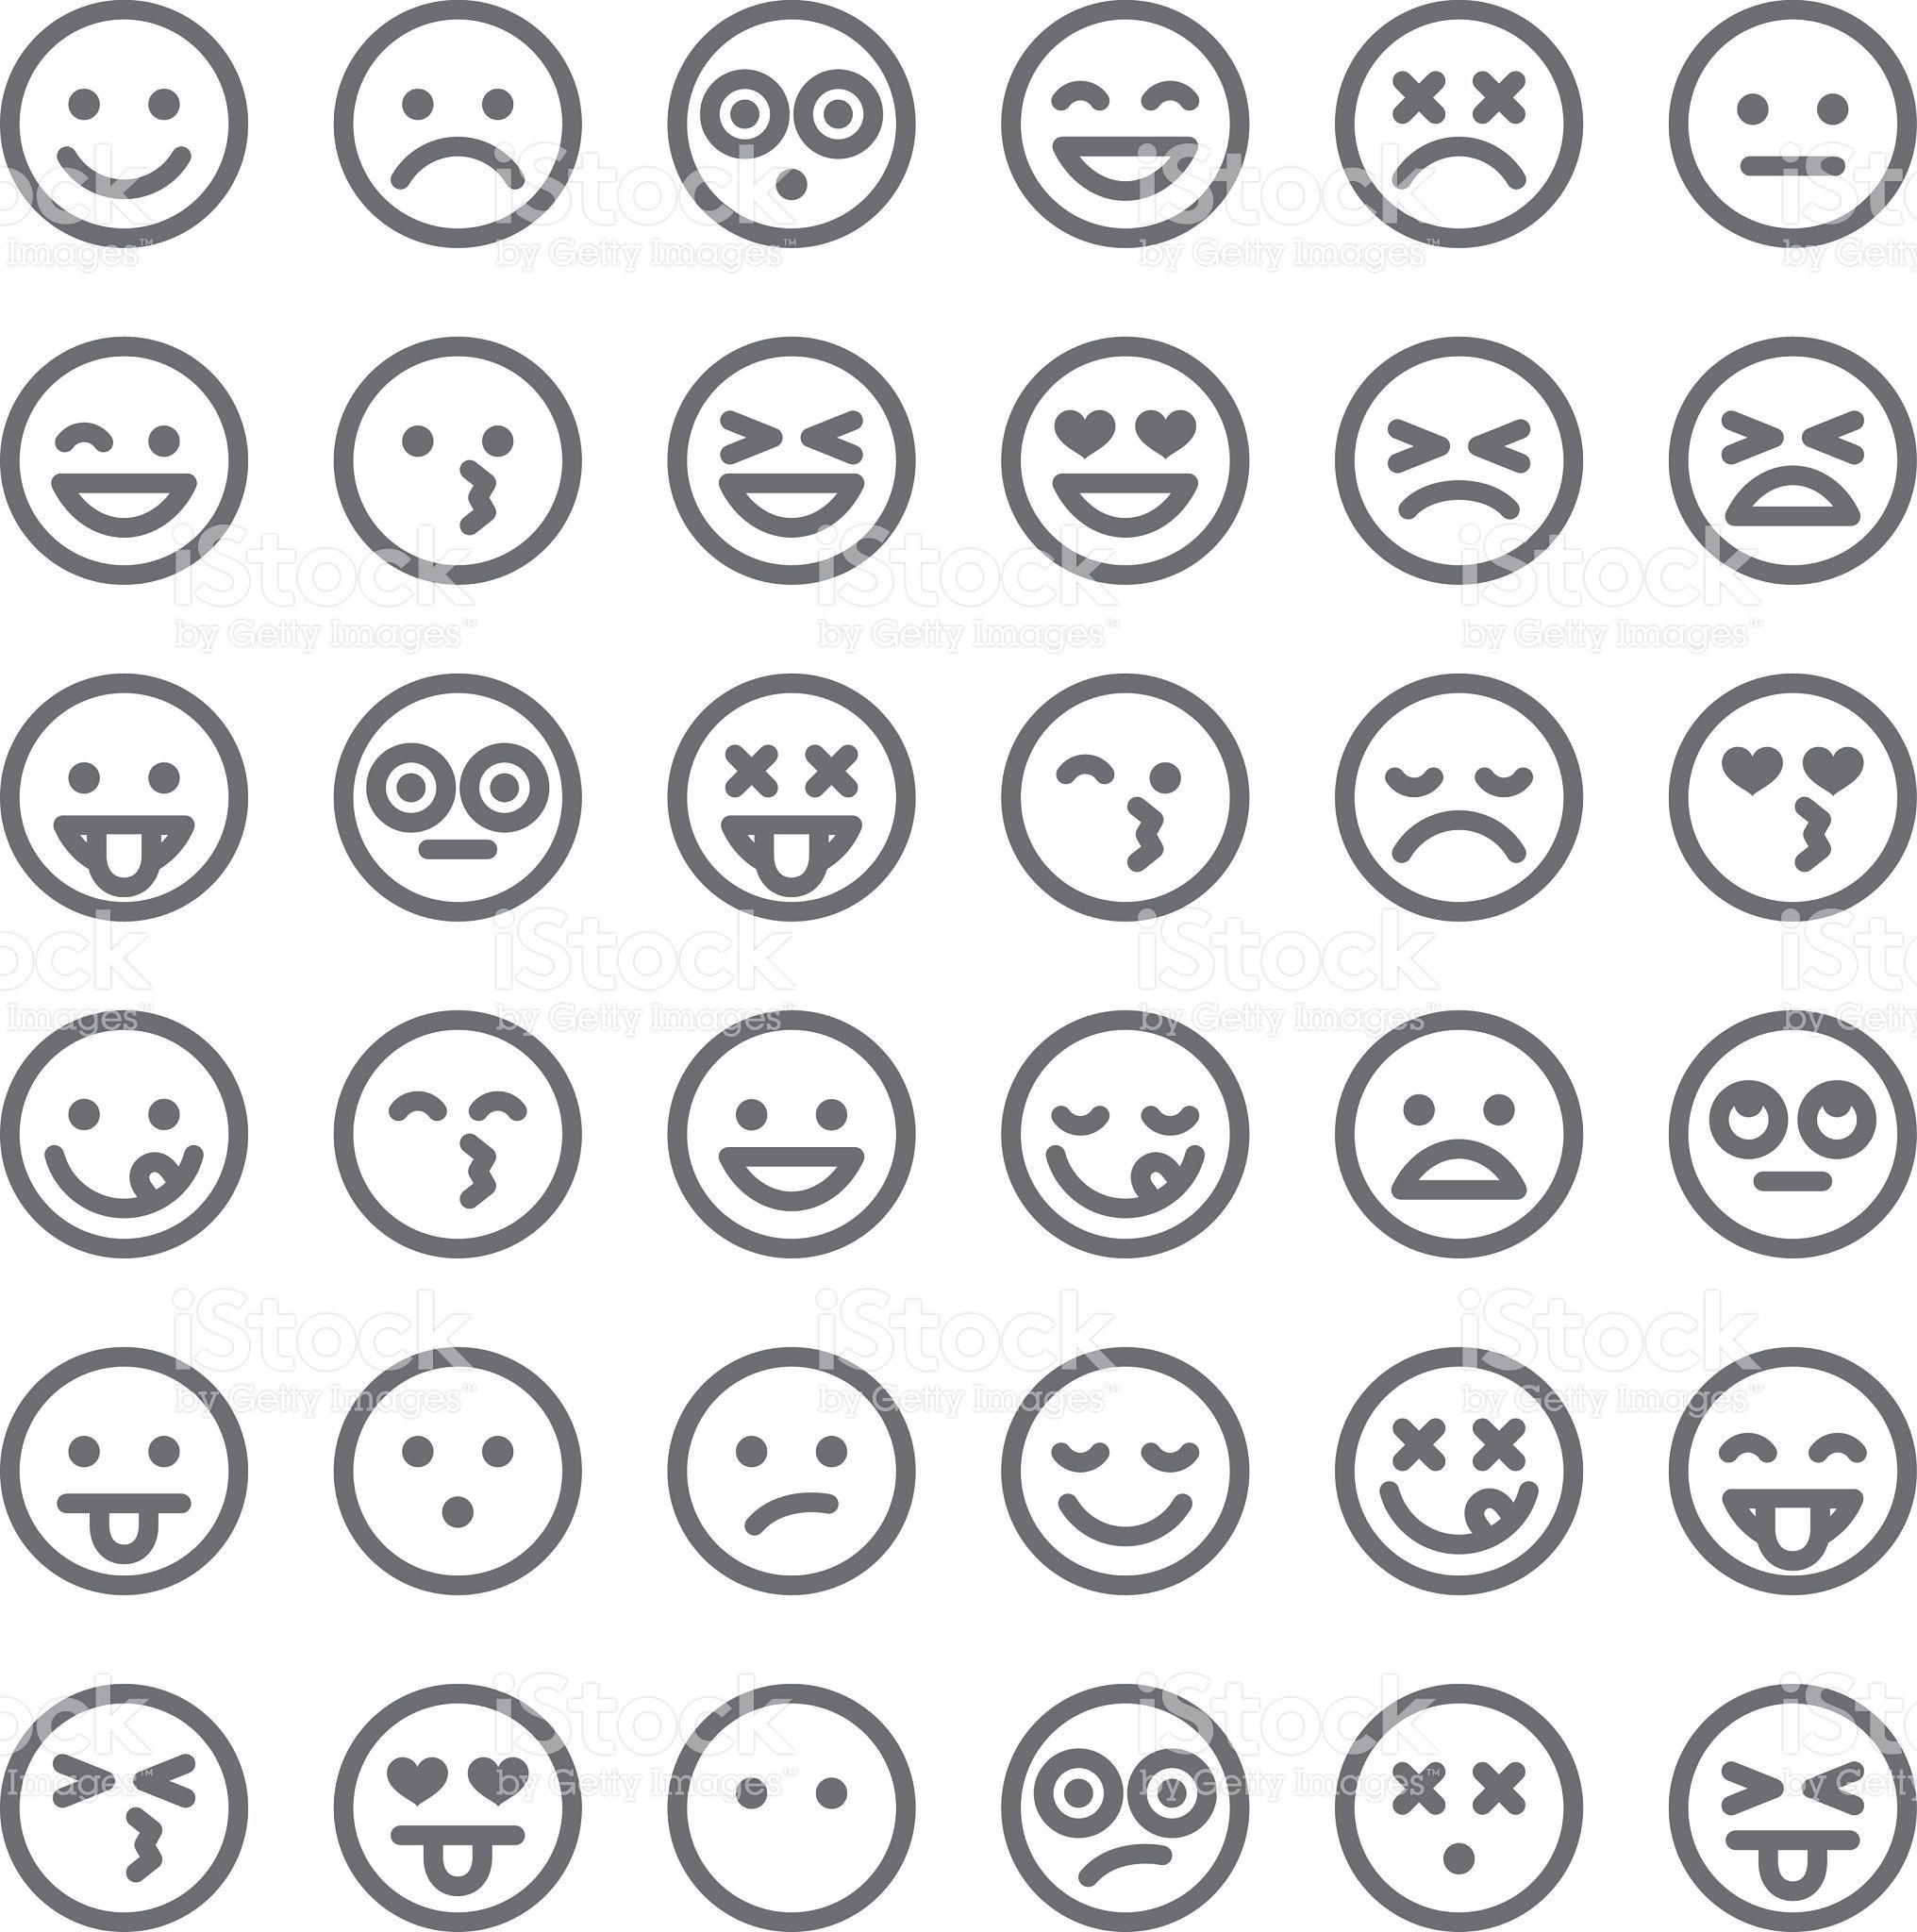 Cute Set Of Simple Emojis Royalty Free Cute Set Of Simple Emojis Stock Vector Art More Images Of Anthropomorphic Smiley Face Free Emoji Emoji Pictures Emoji